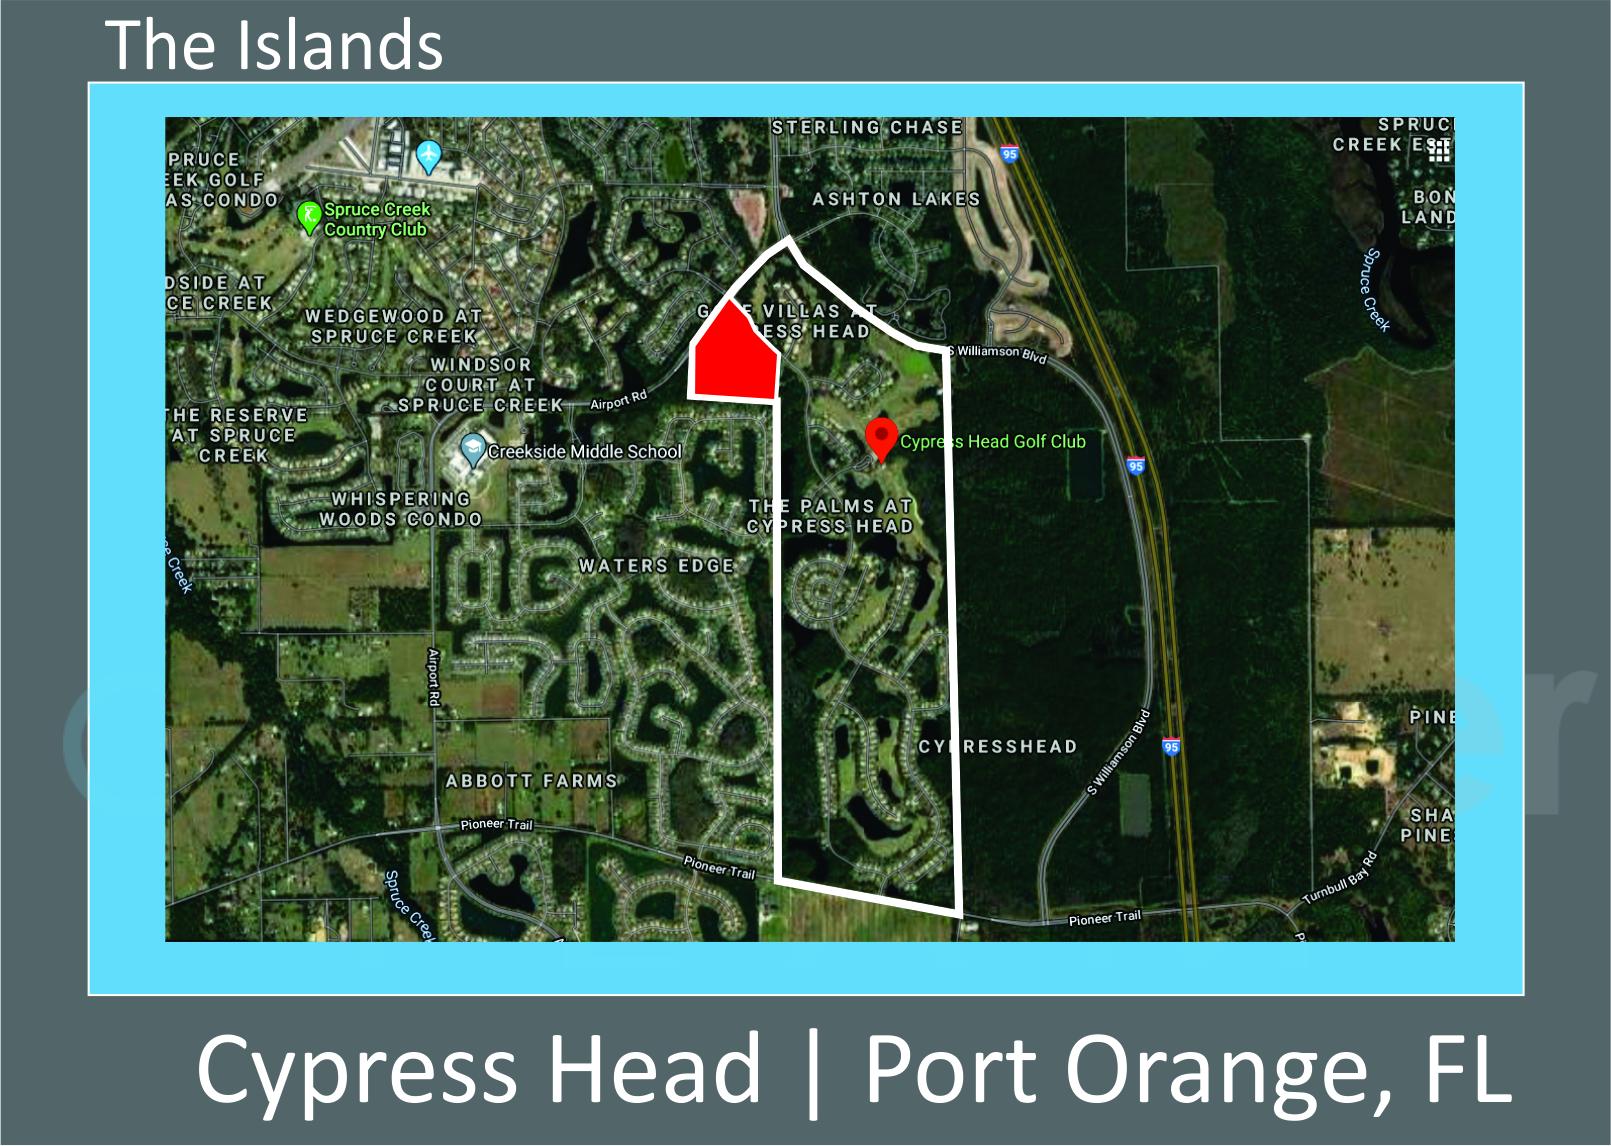 Map of Cypress Head The Islands, Port Orange, FL